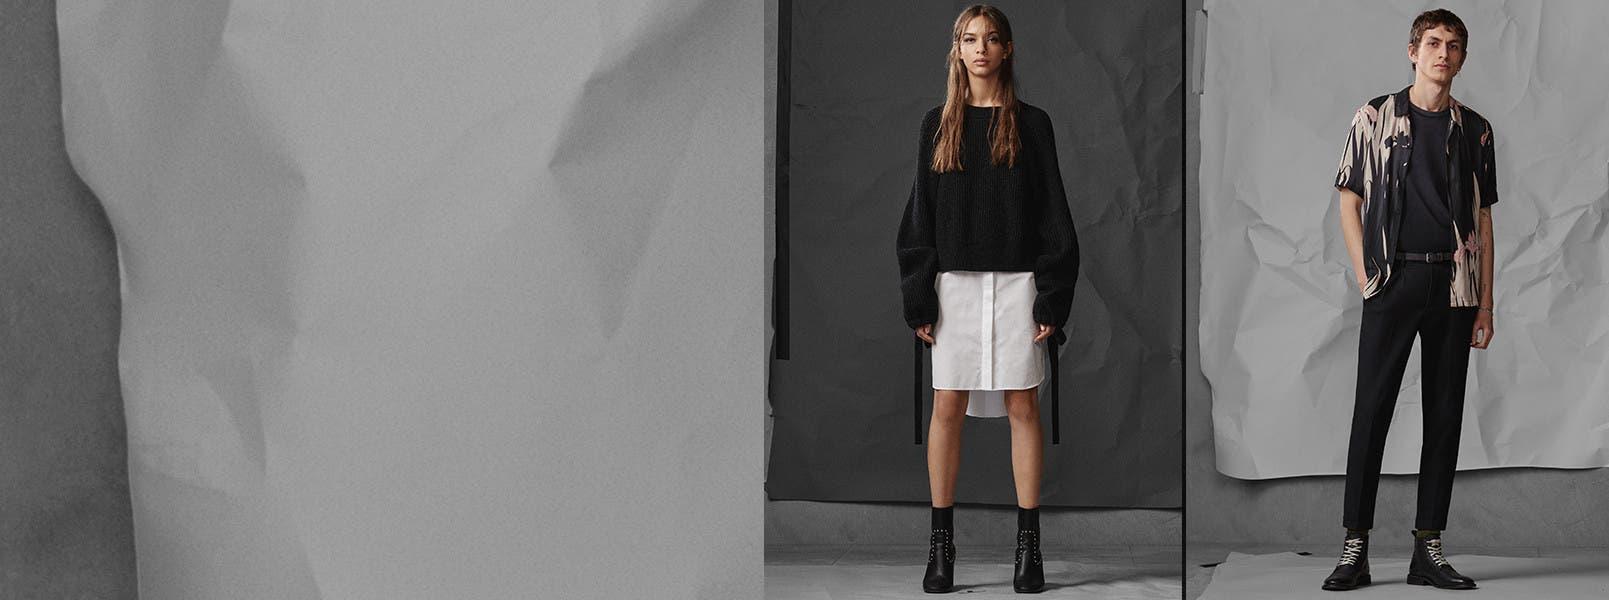 Introducing ALLSAINTS apparel.